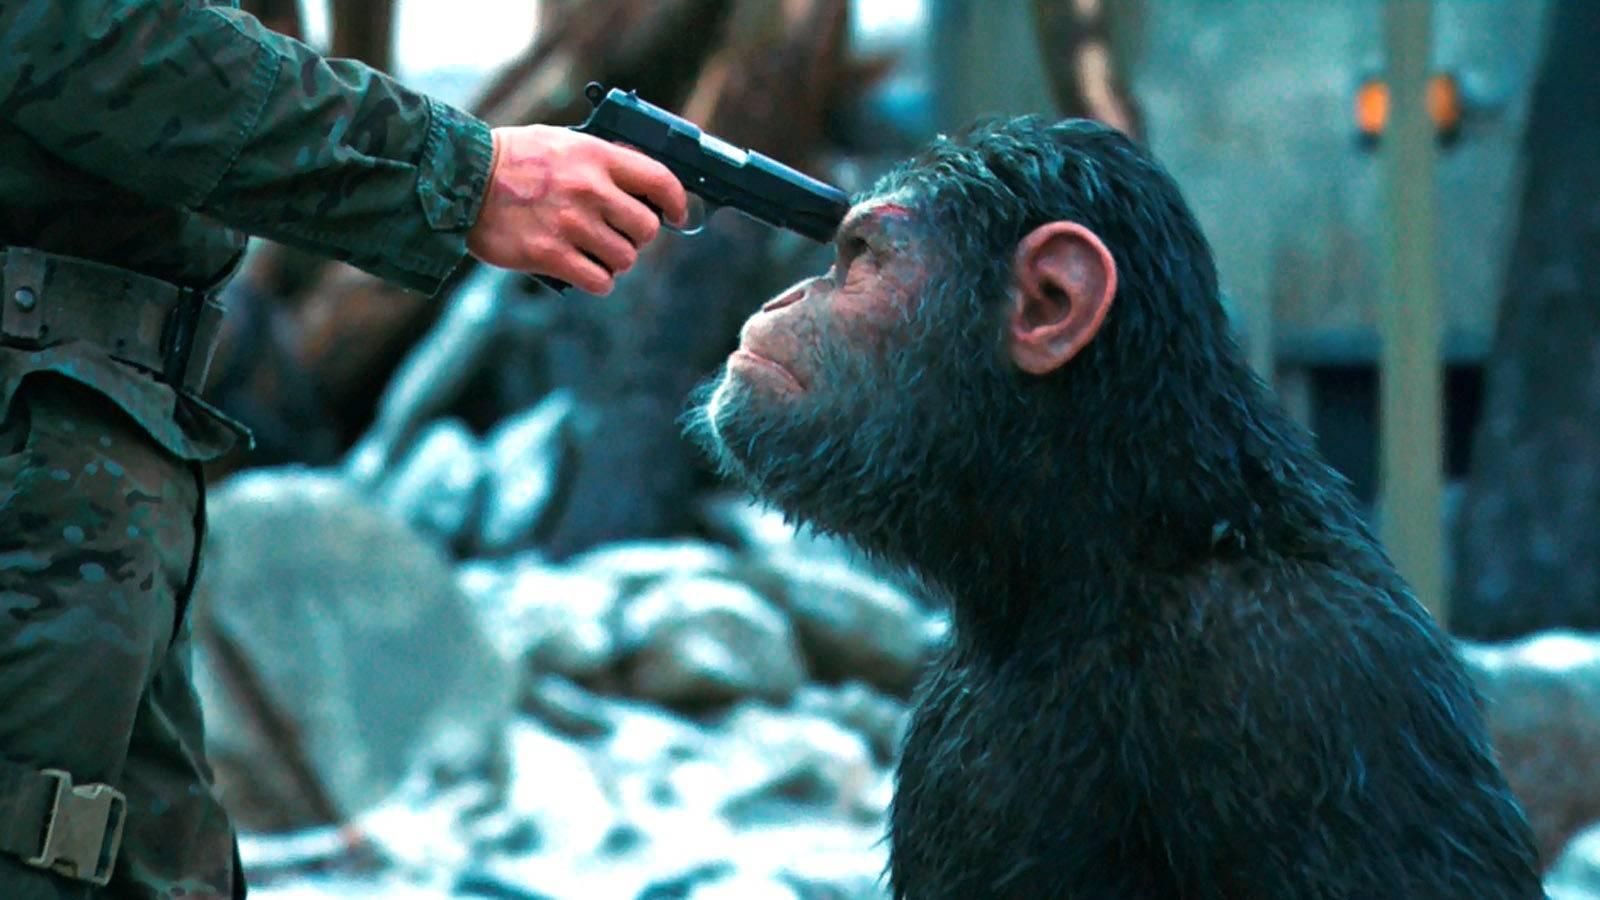 «Планета обезьян: Война» — лучший «Варкрафт», чем сам «Варкрафт» 2